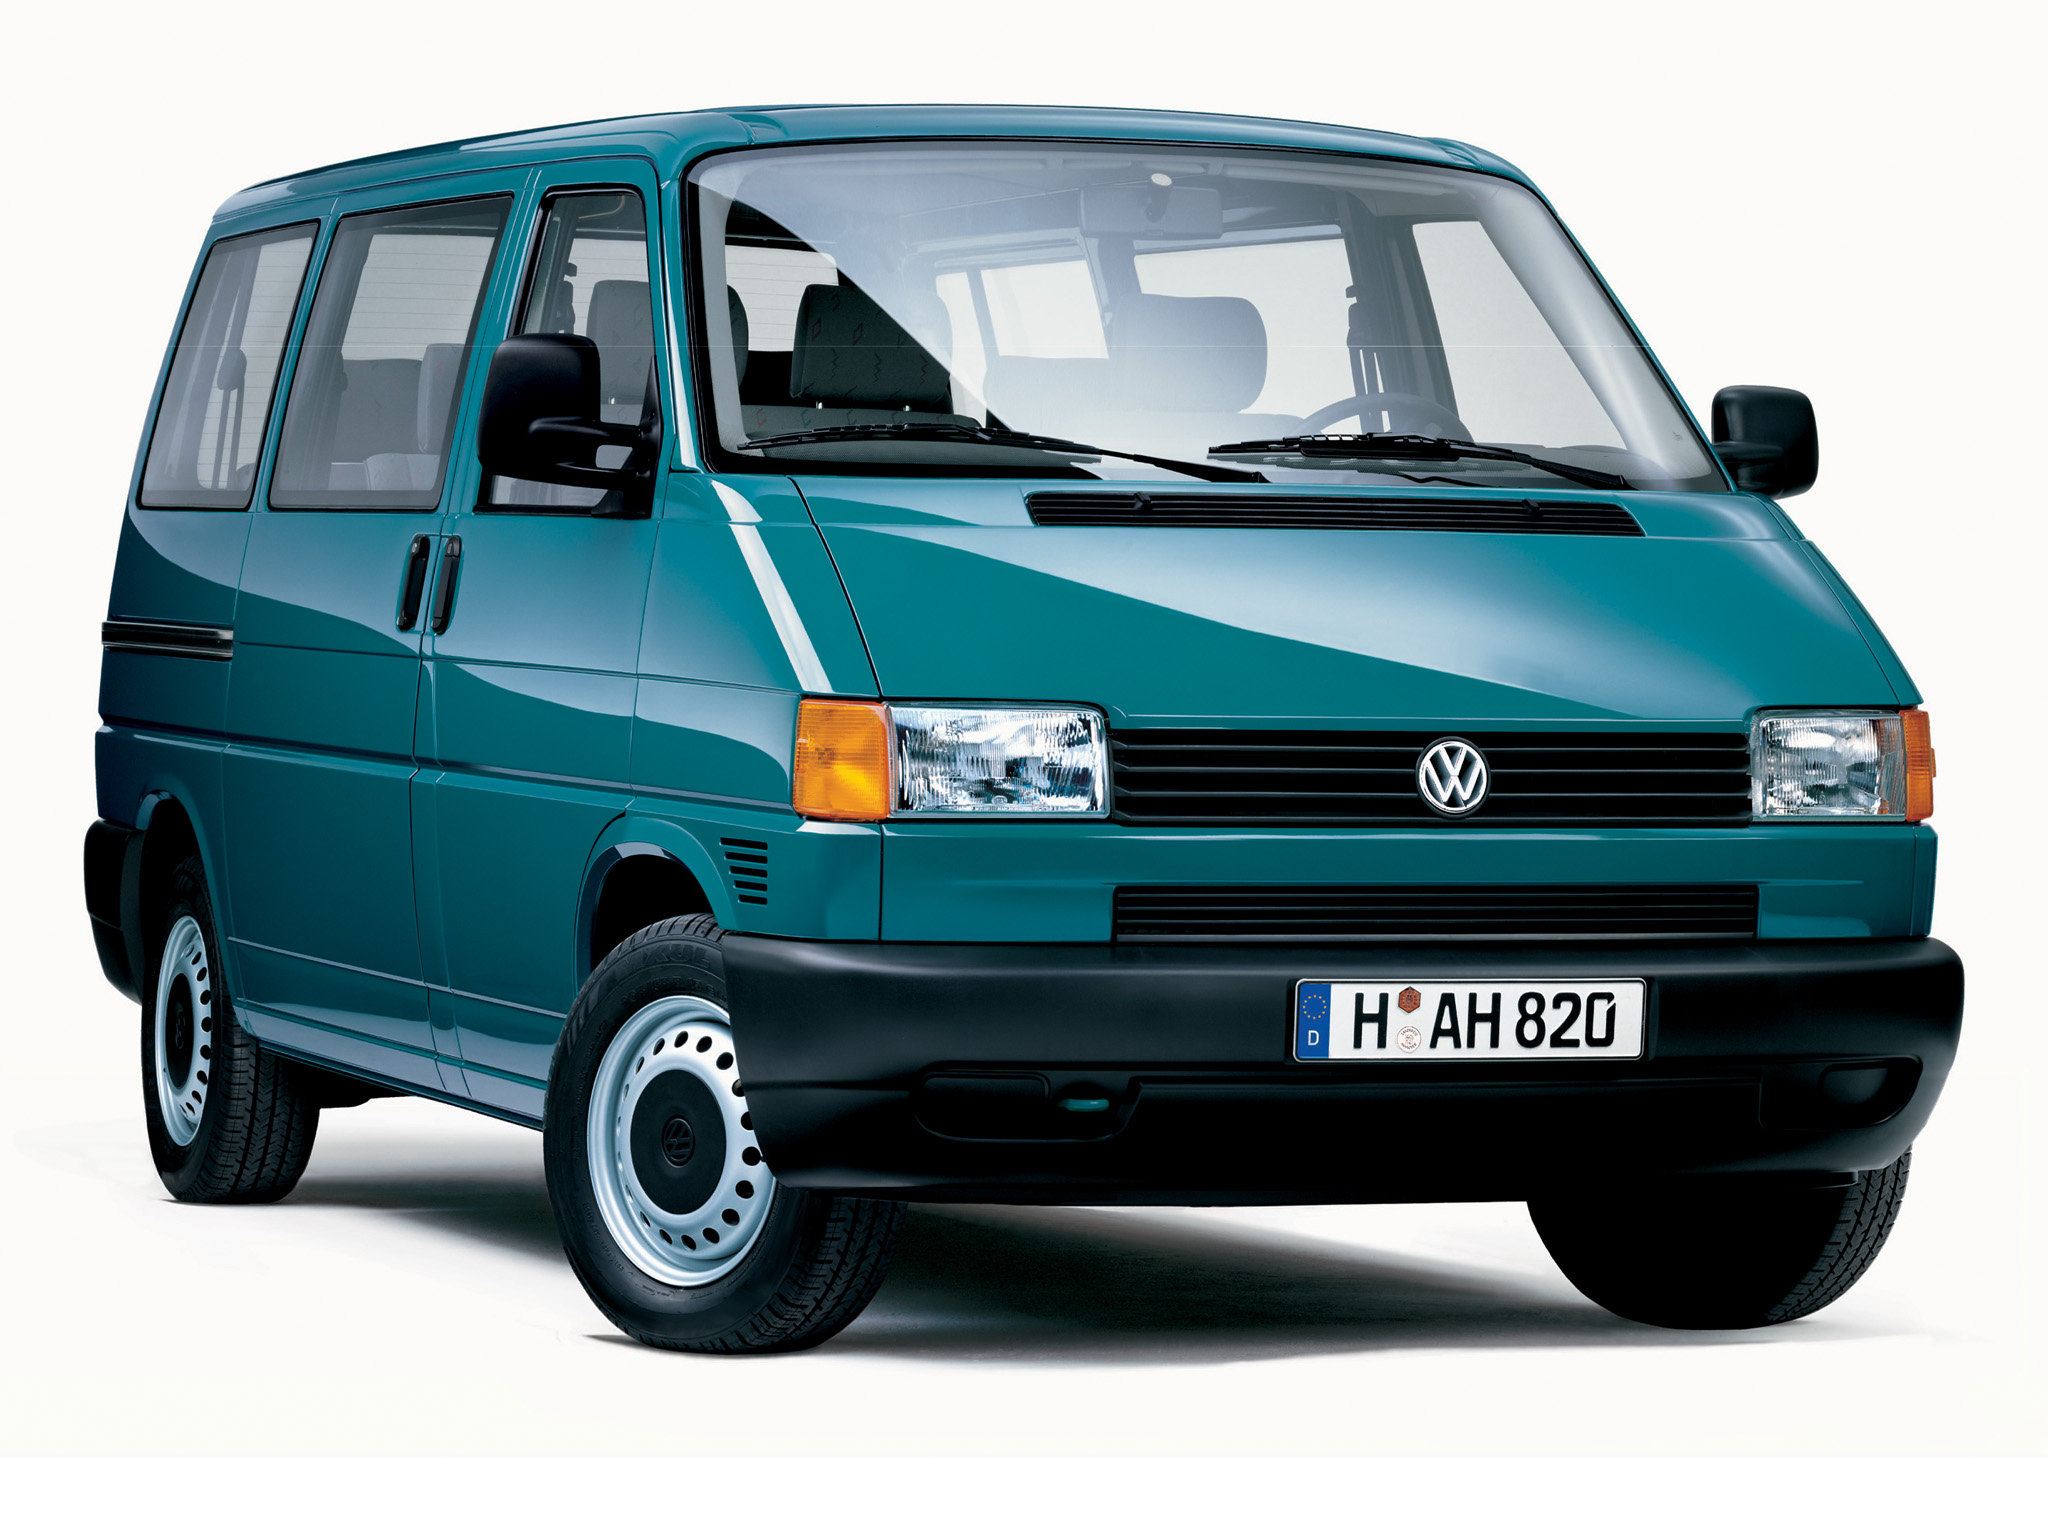 Грузопассажирский Volkswagen T4 Transporter. 1990 - 2003 годы